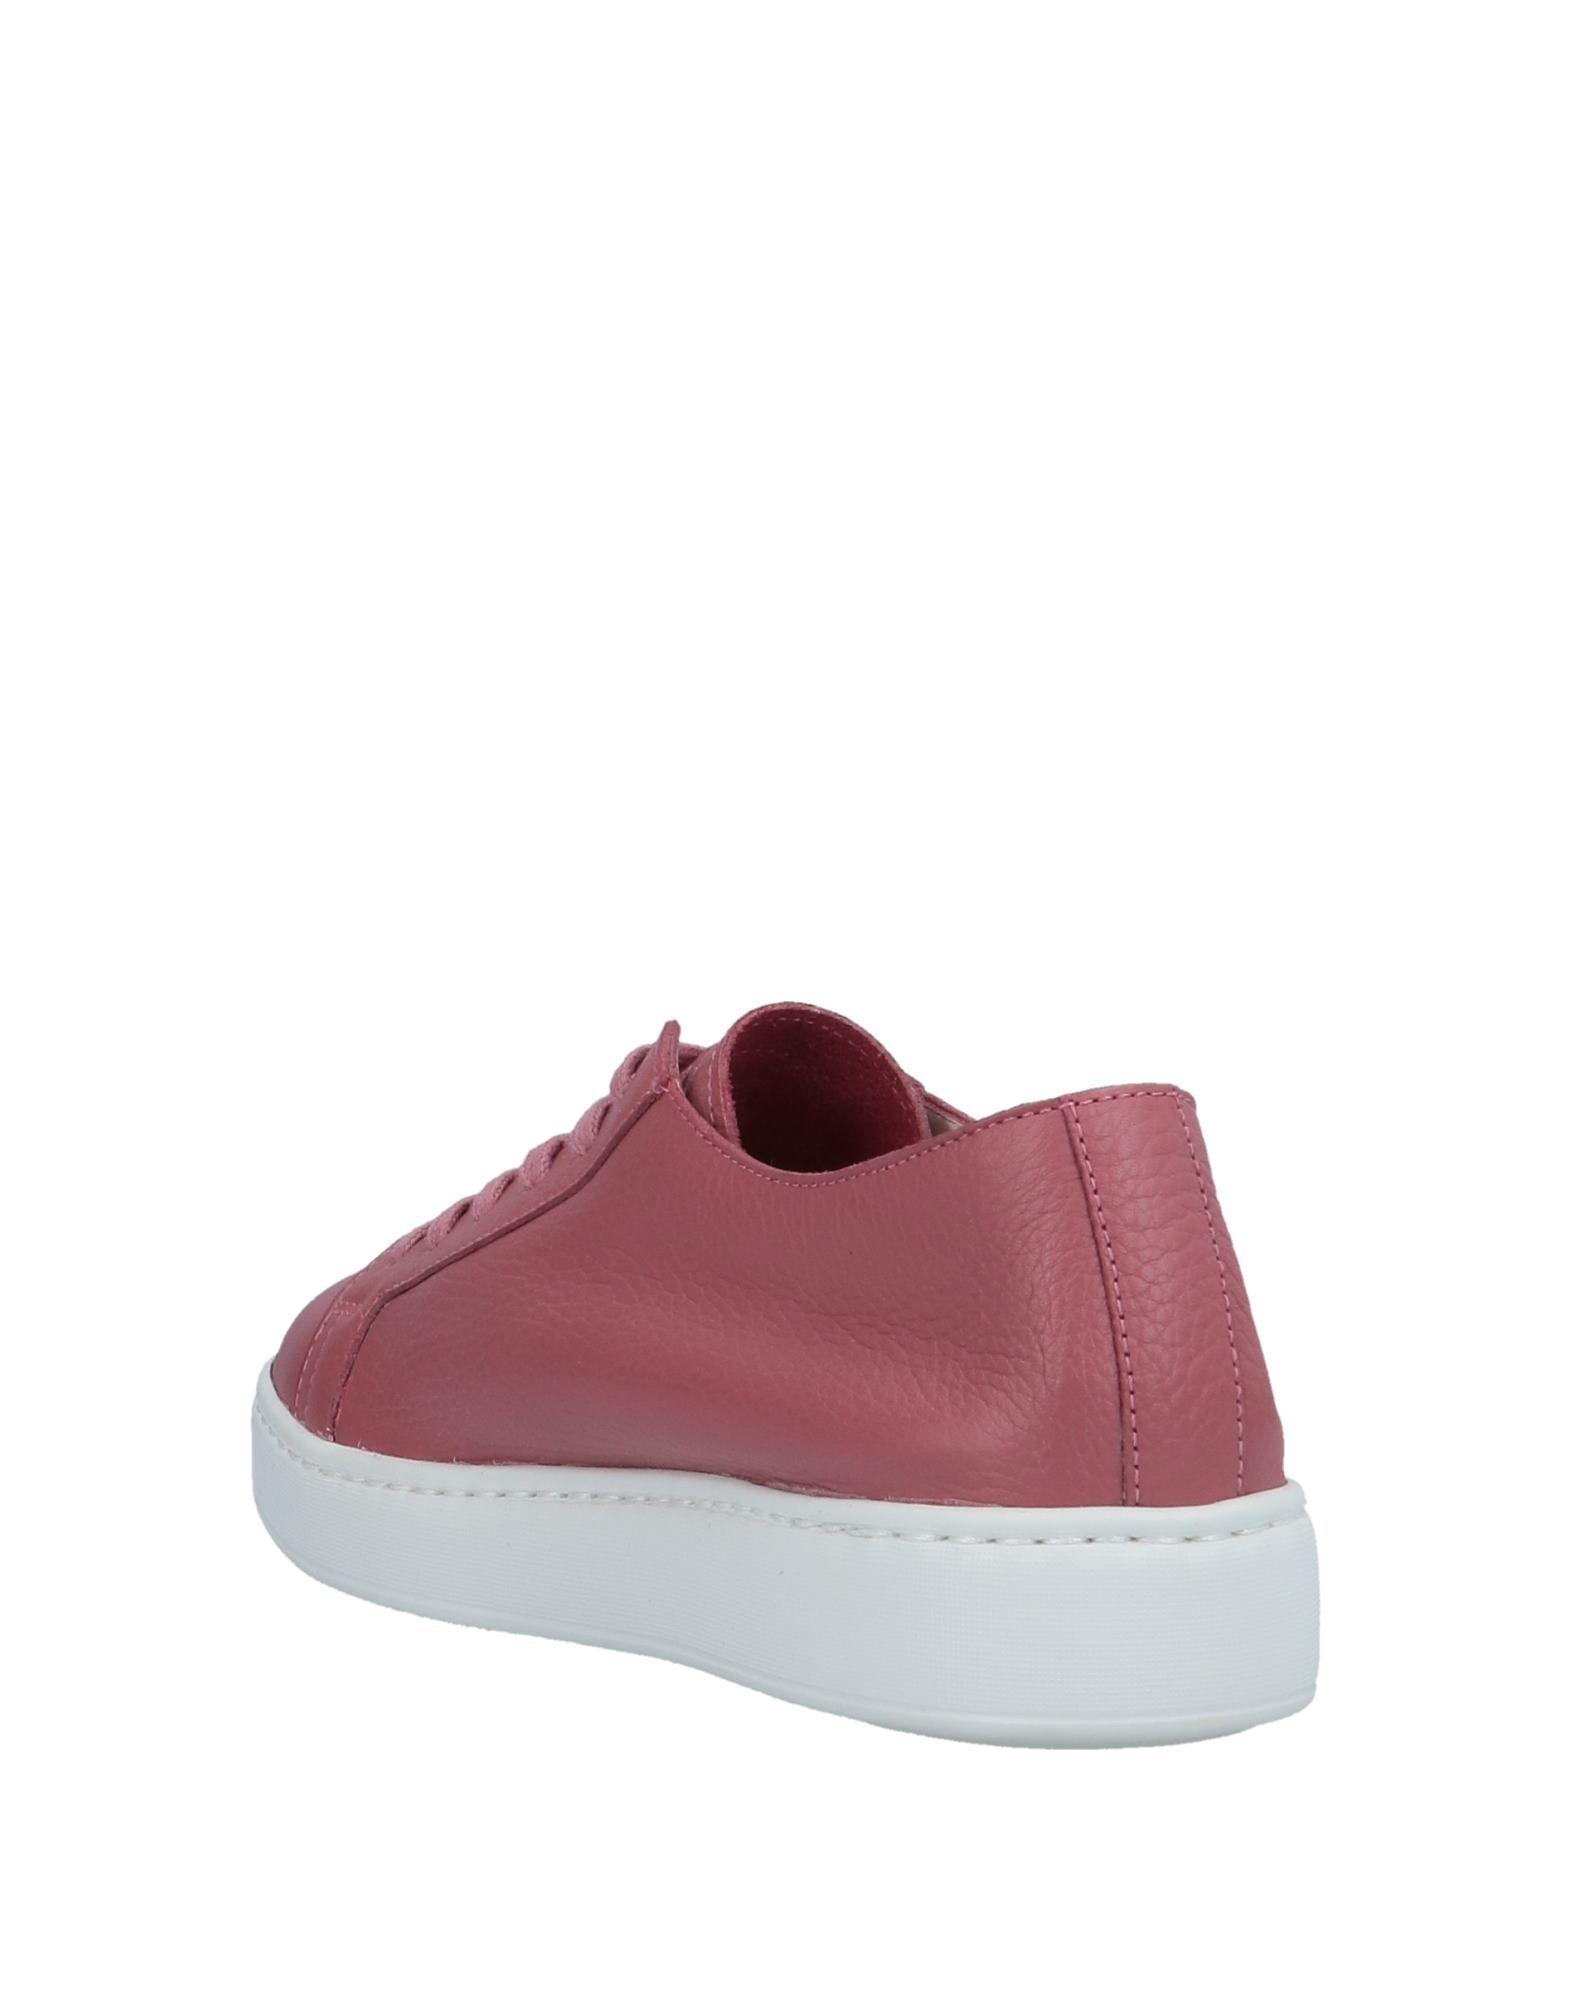 Sneakers & Tennis basses Cuir Santoni en coloris Rose D4oA